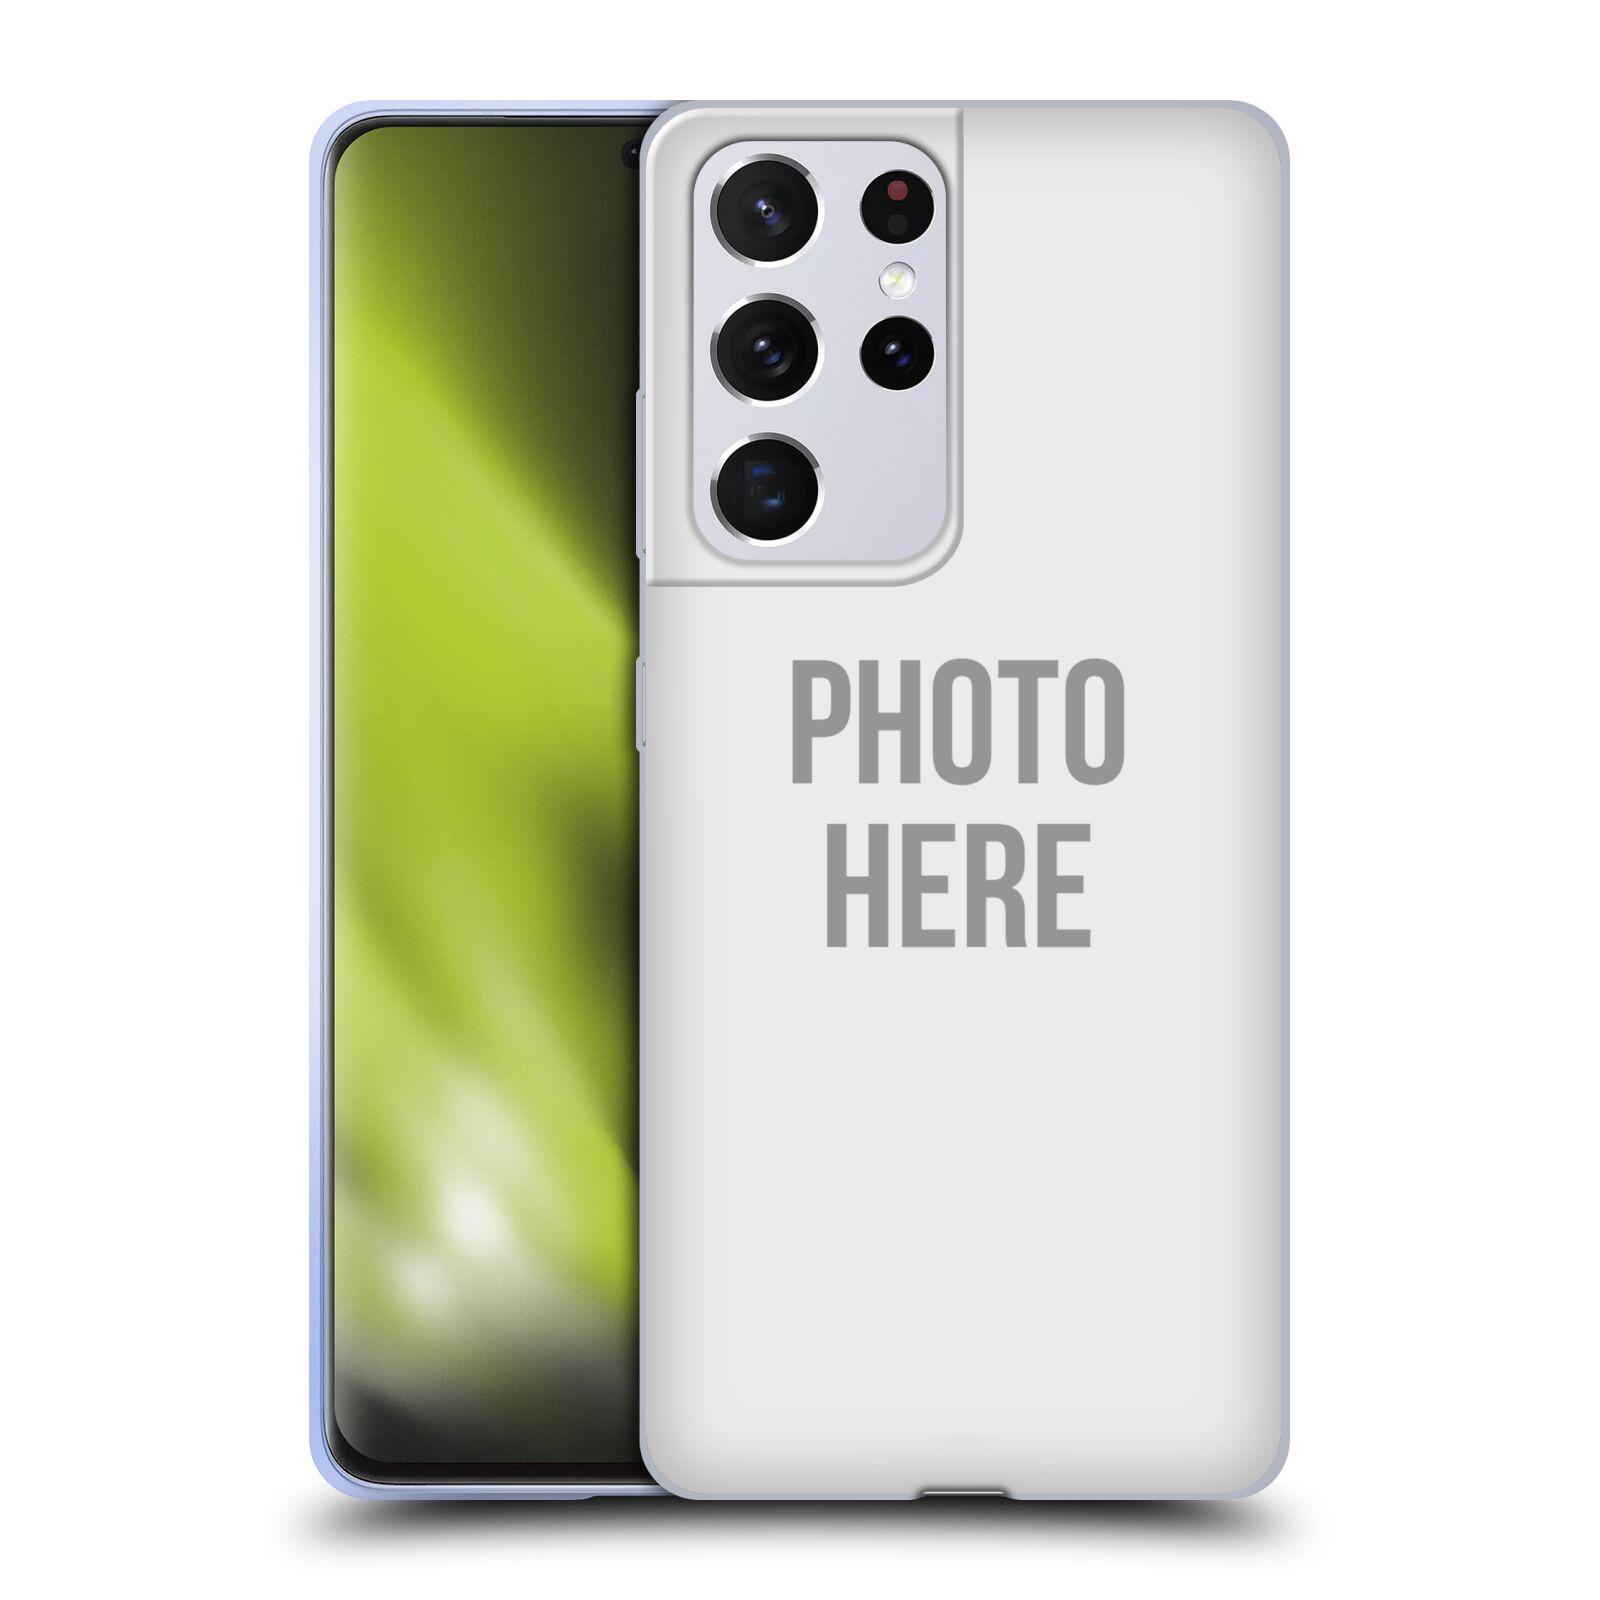 Silikonové pouzdro na mobil Samsung Galaxy S21 Ultra 5G s vlastním motivem